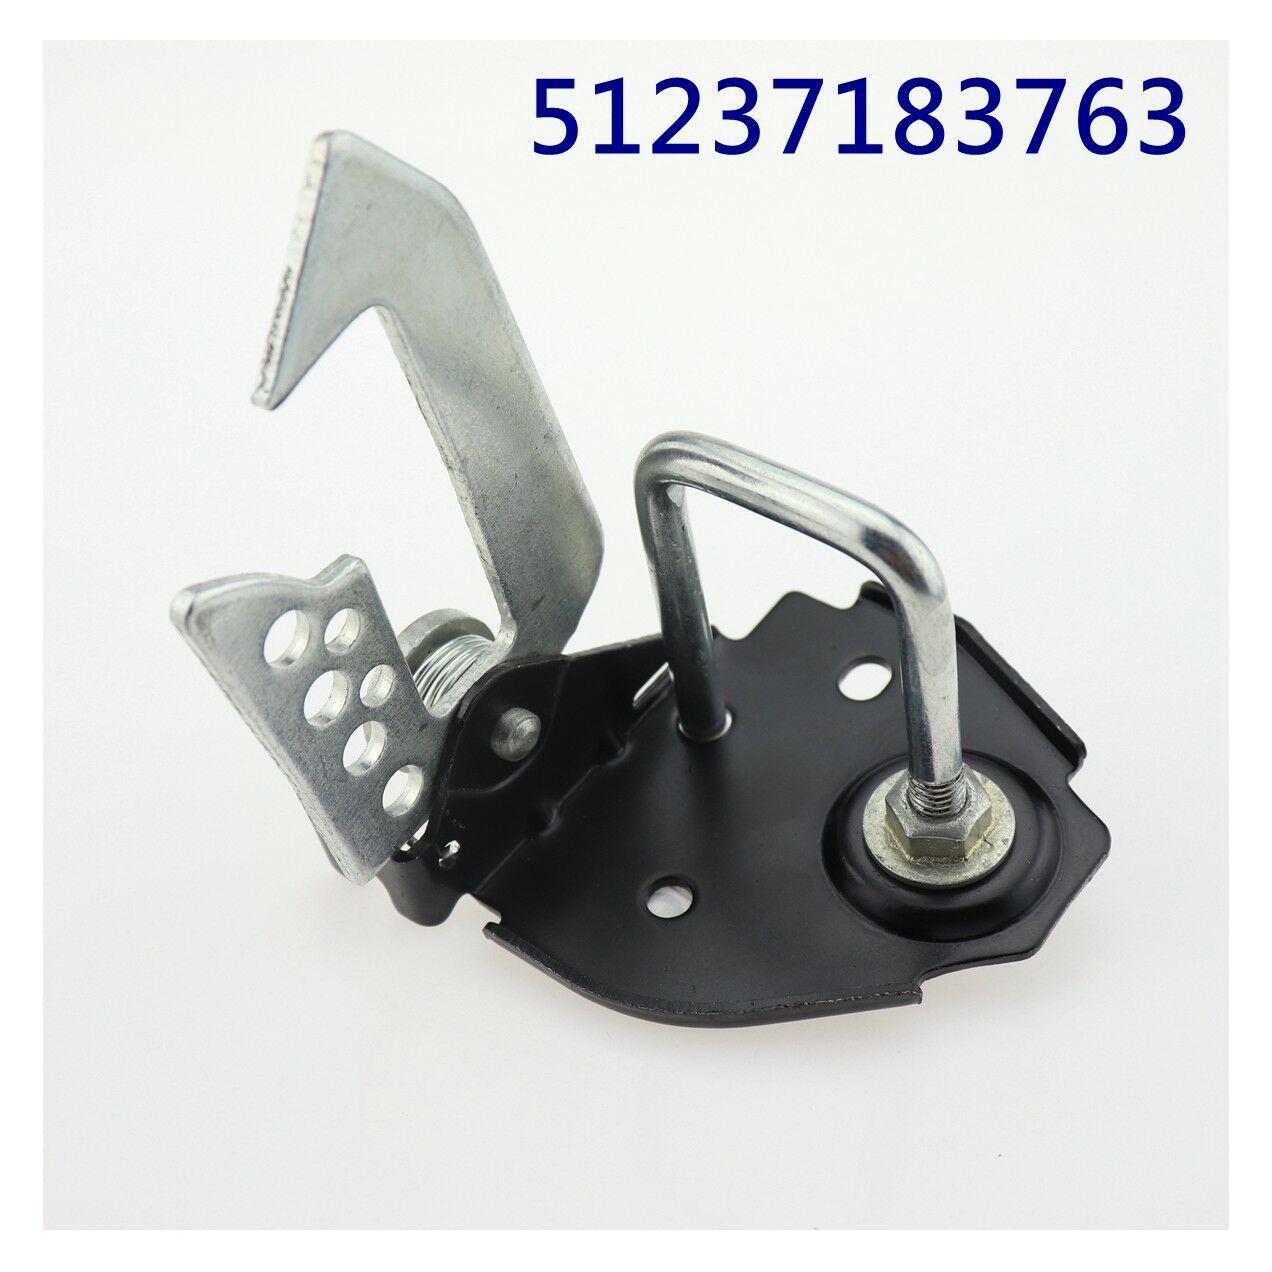 A Set 4 Pieces Hood Lock Latch for BMW 528i 535i 550i 640i 650i 740i 750i M5 M6